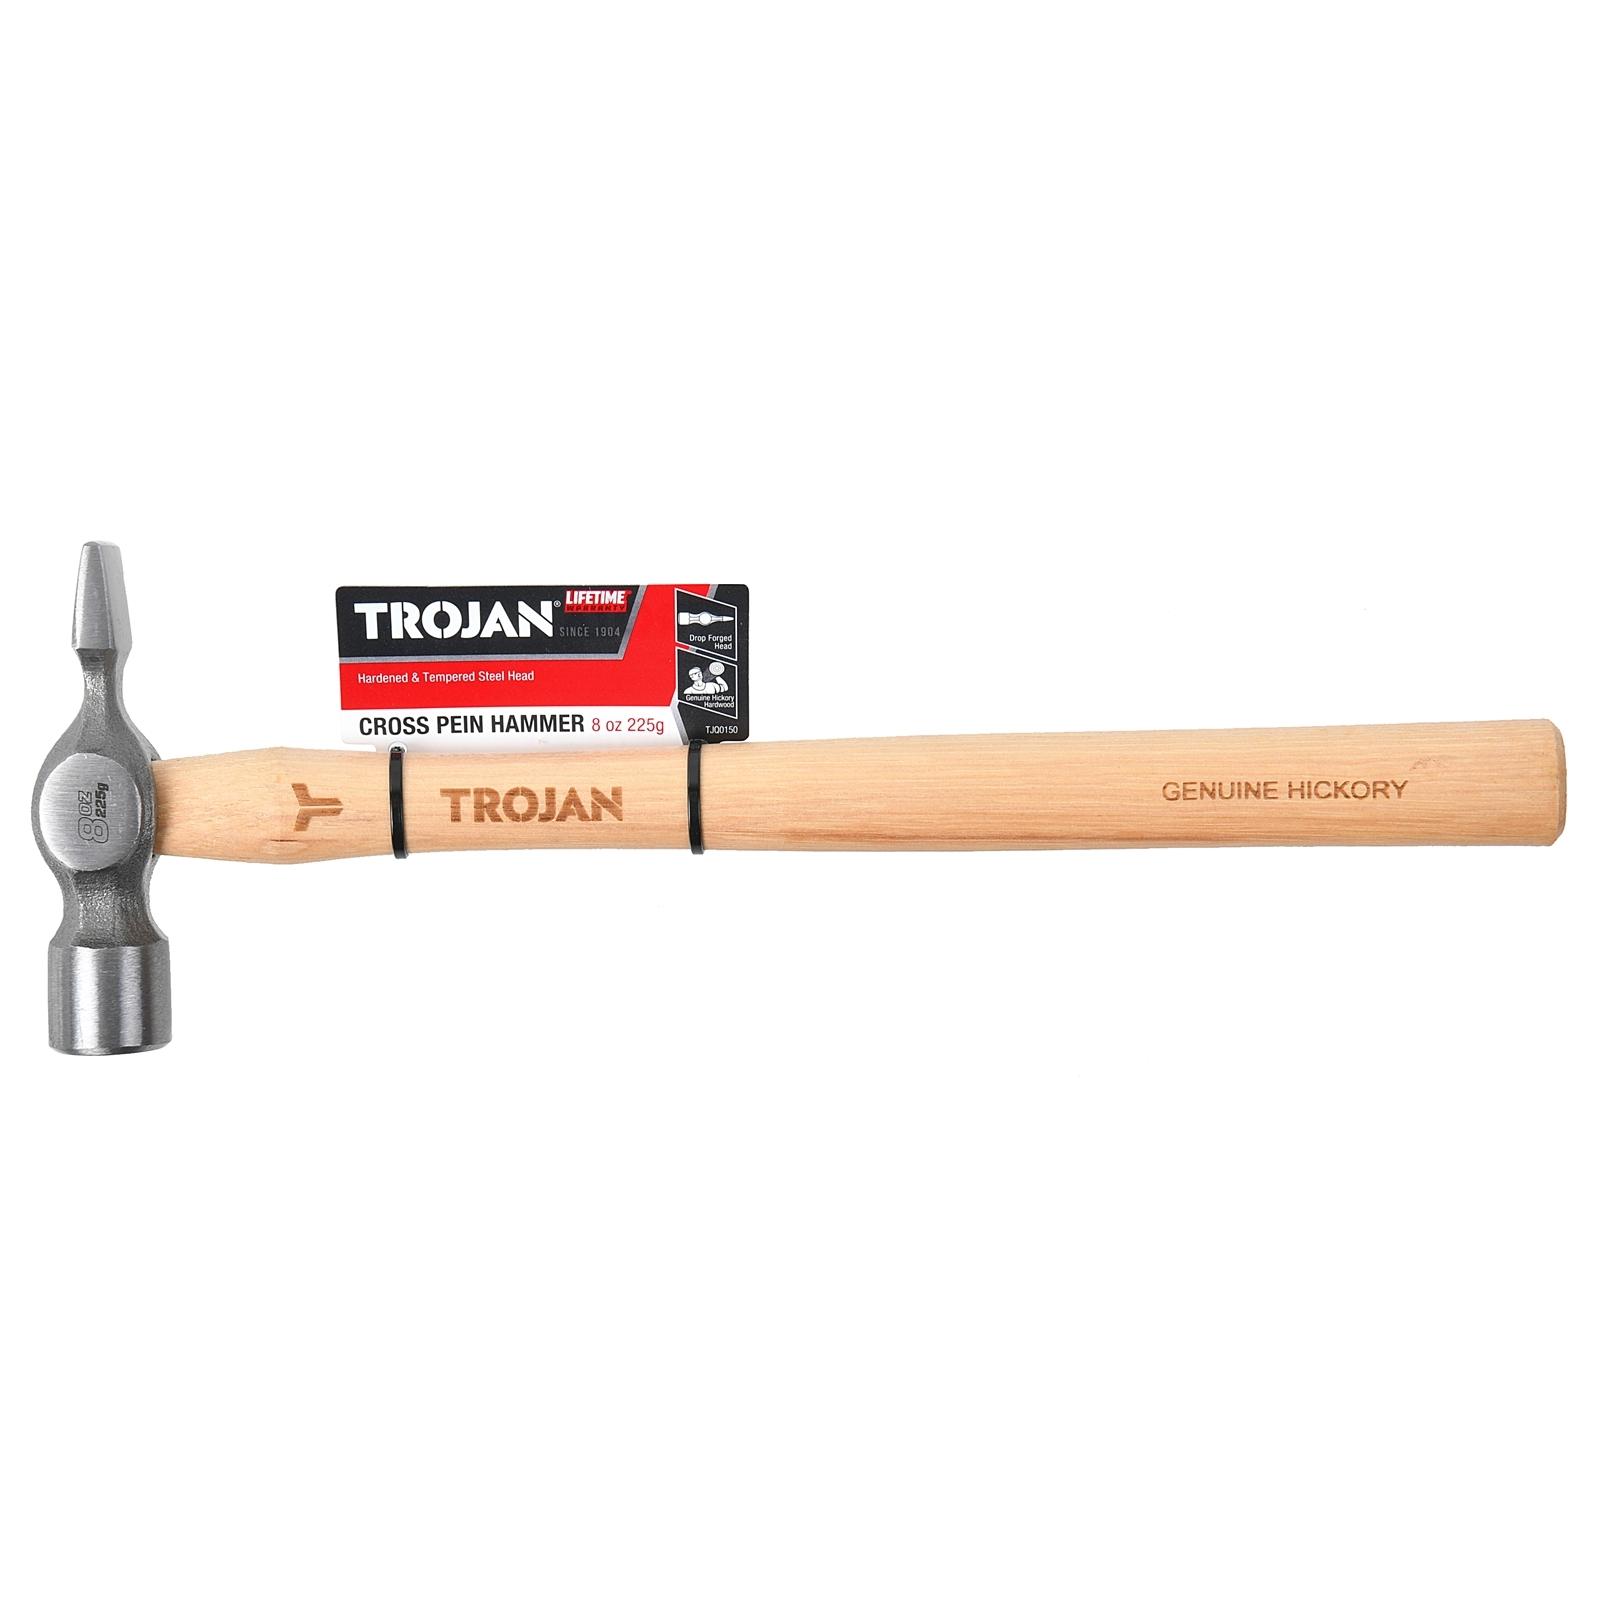 Trojan 8oz 225g Cross Pein Hammer